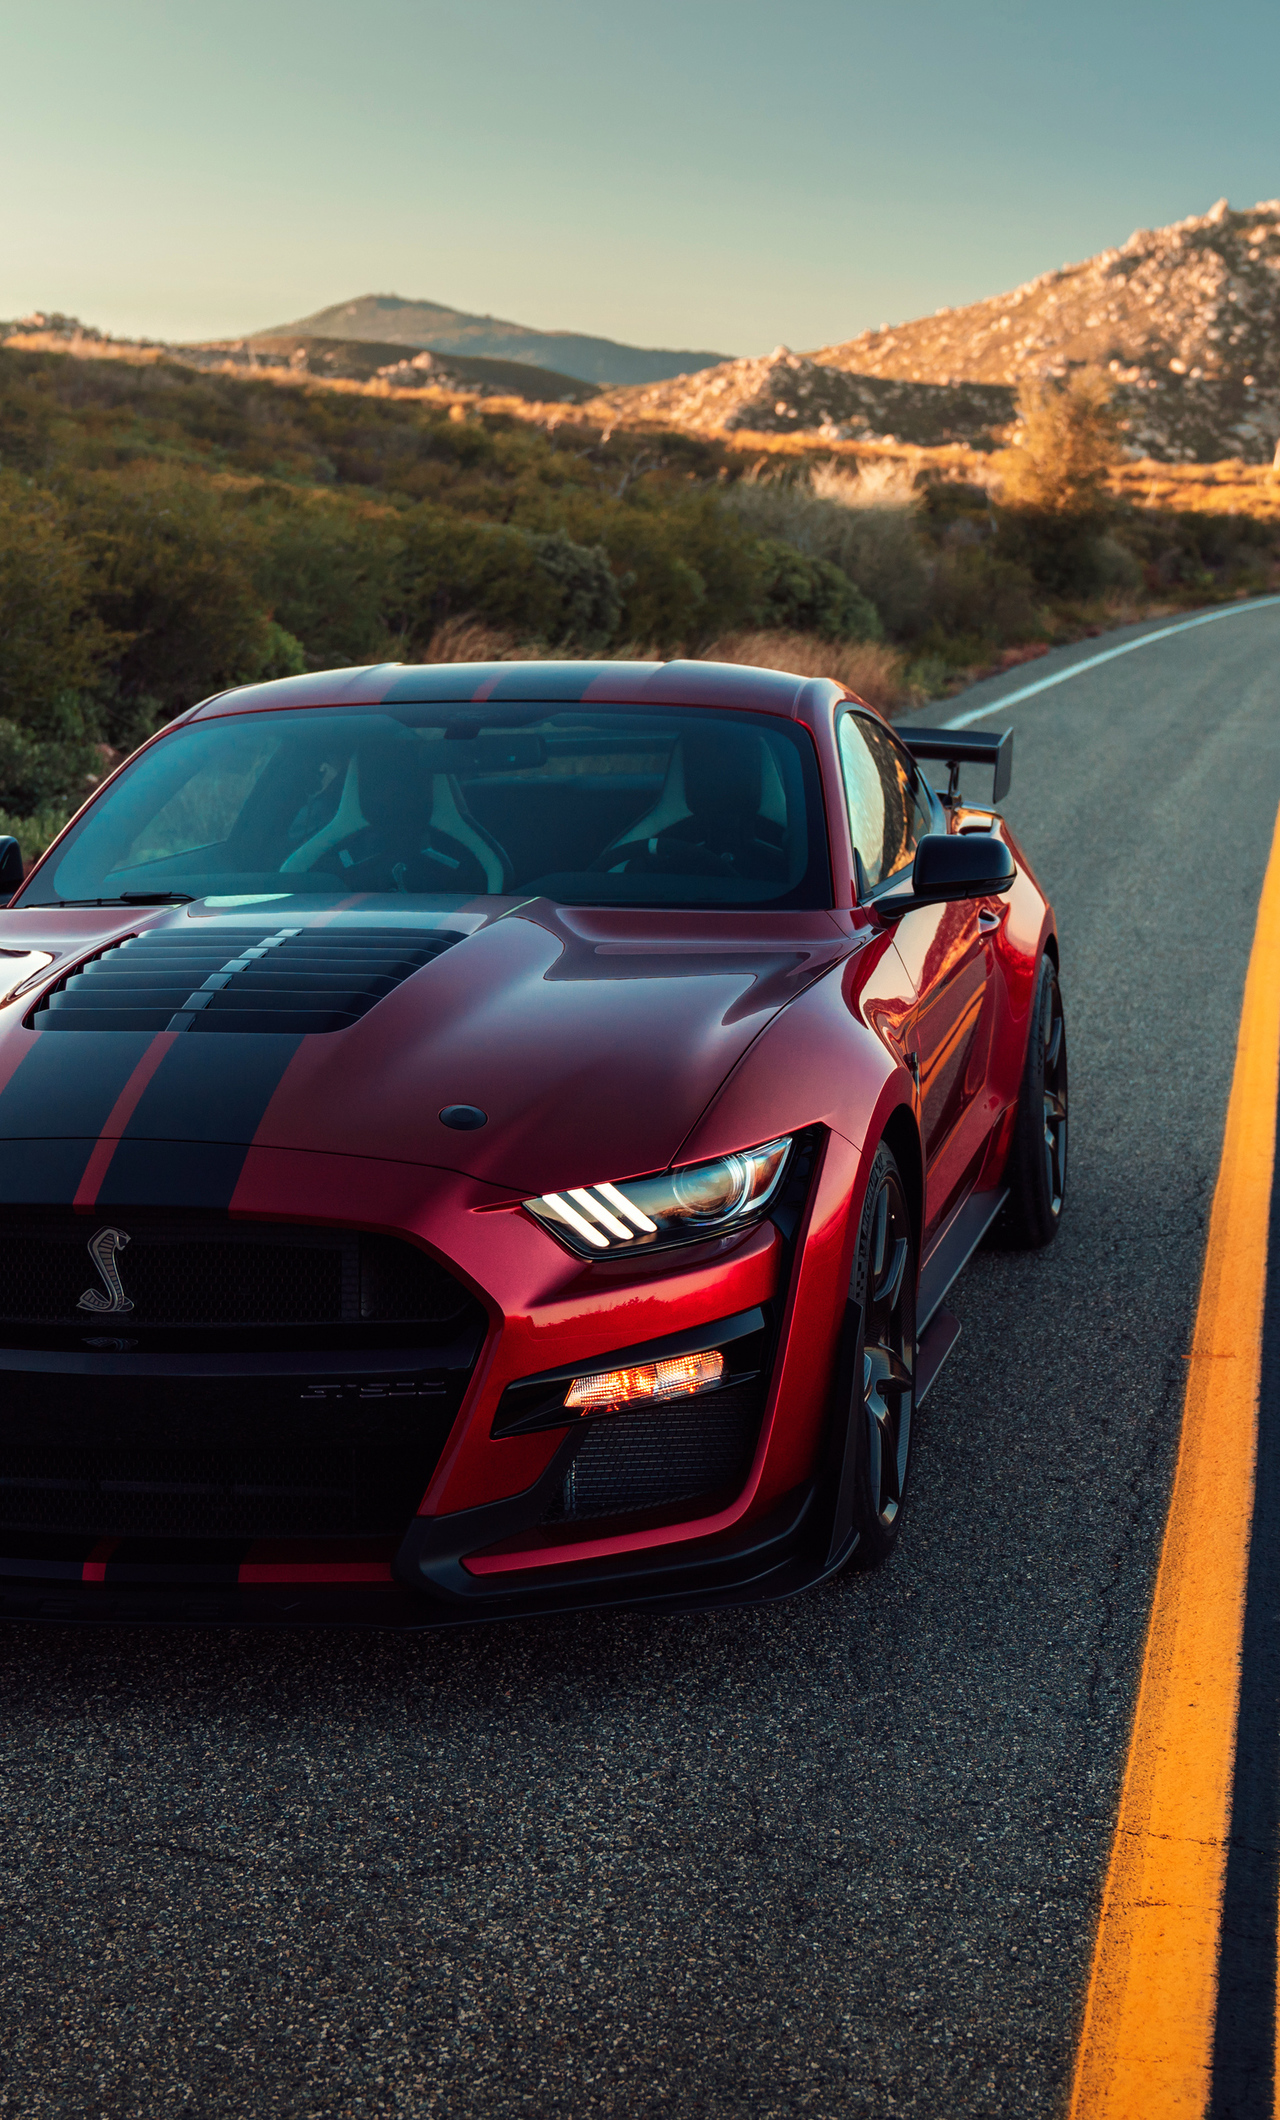 Mustang Car 4k iPhone 2020 Wallpapers 1280x2120